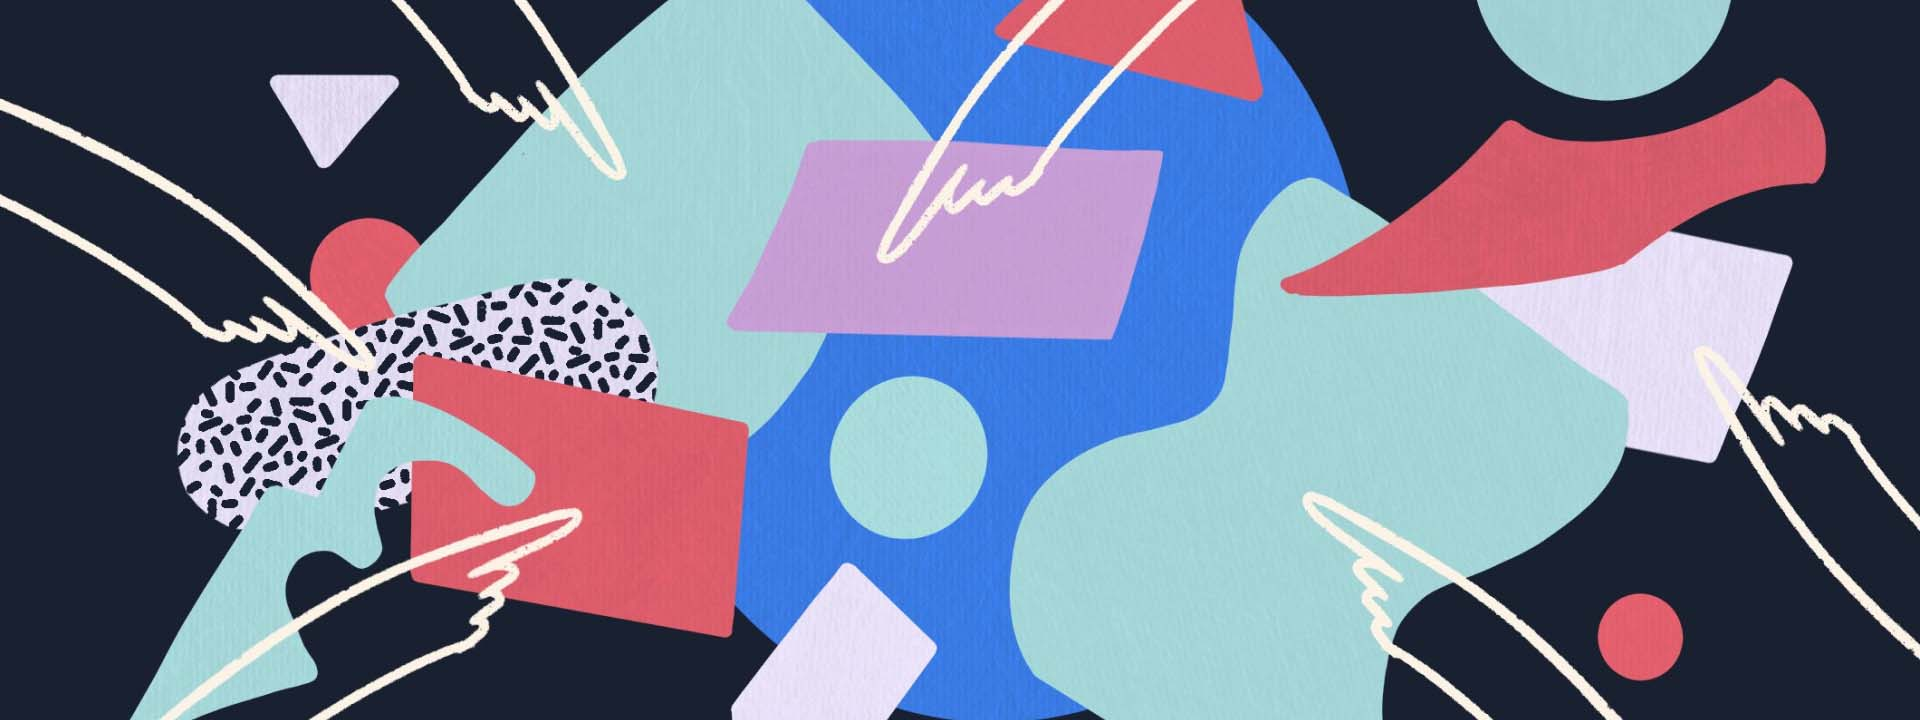 10 FlowMapp features that boost collaborative online work